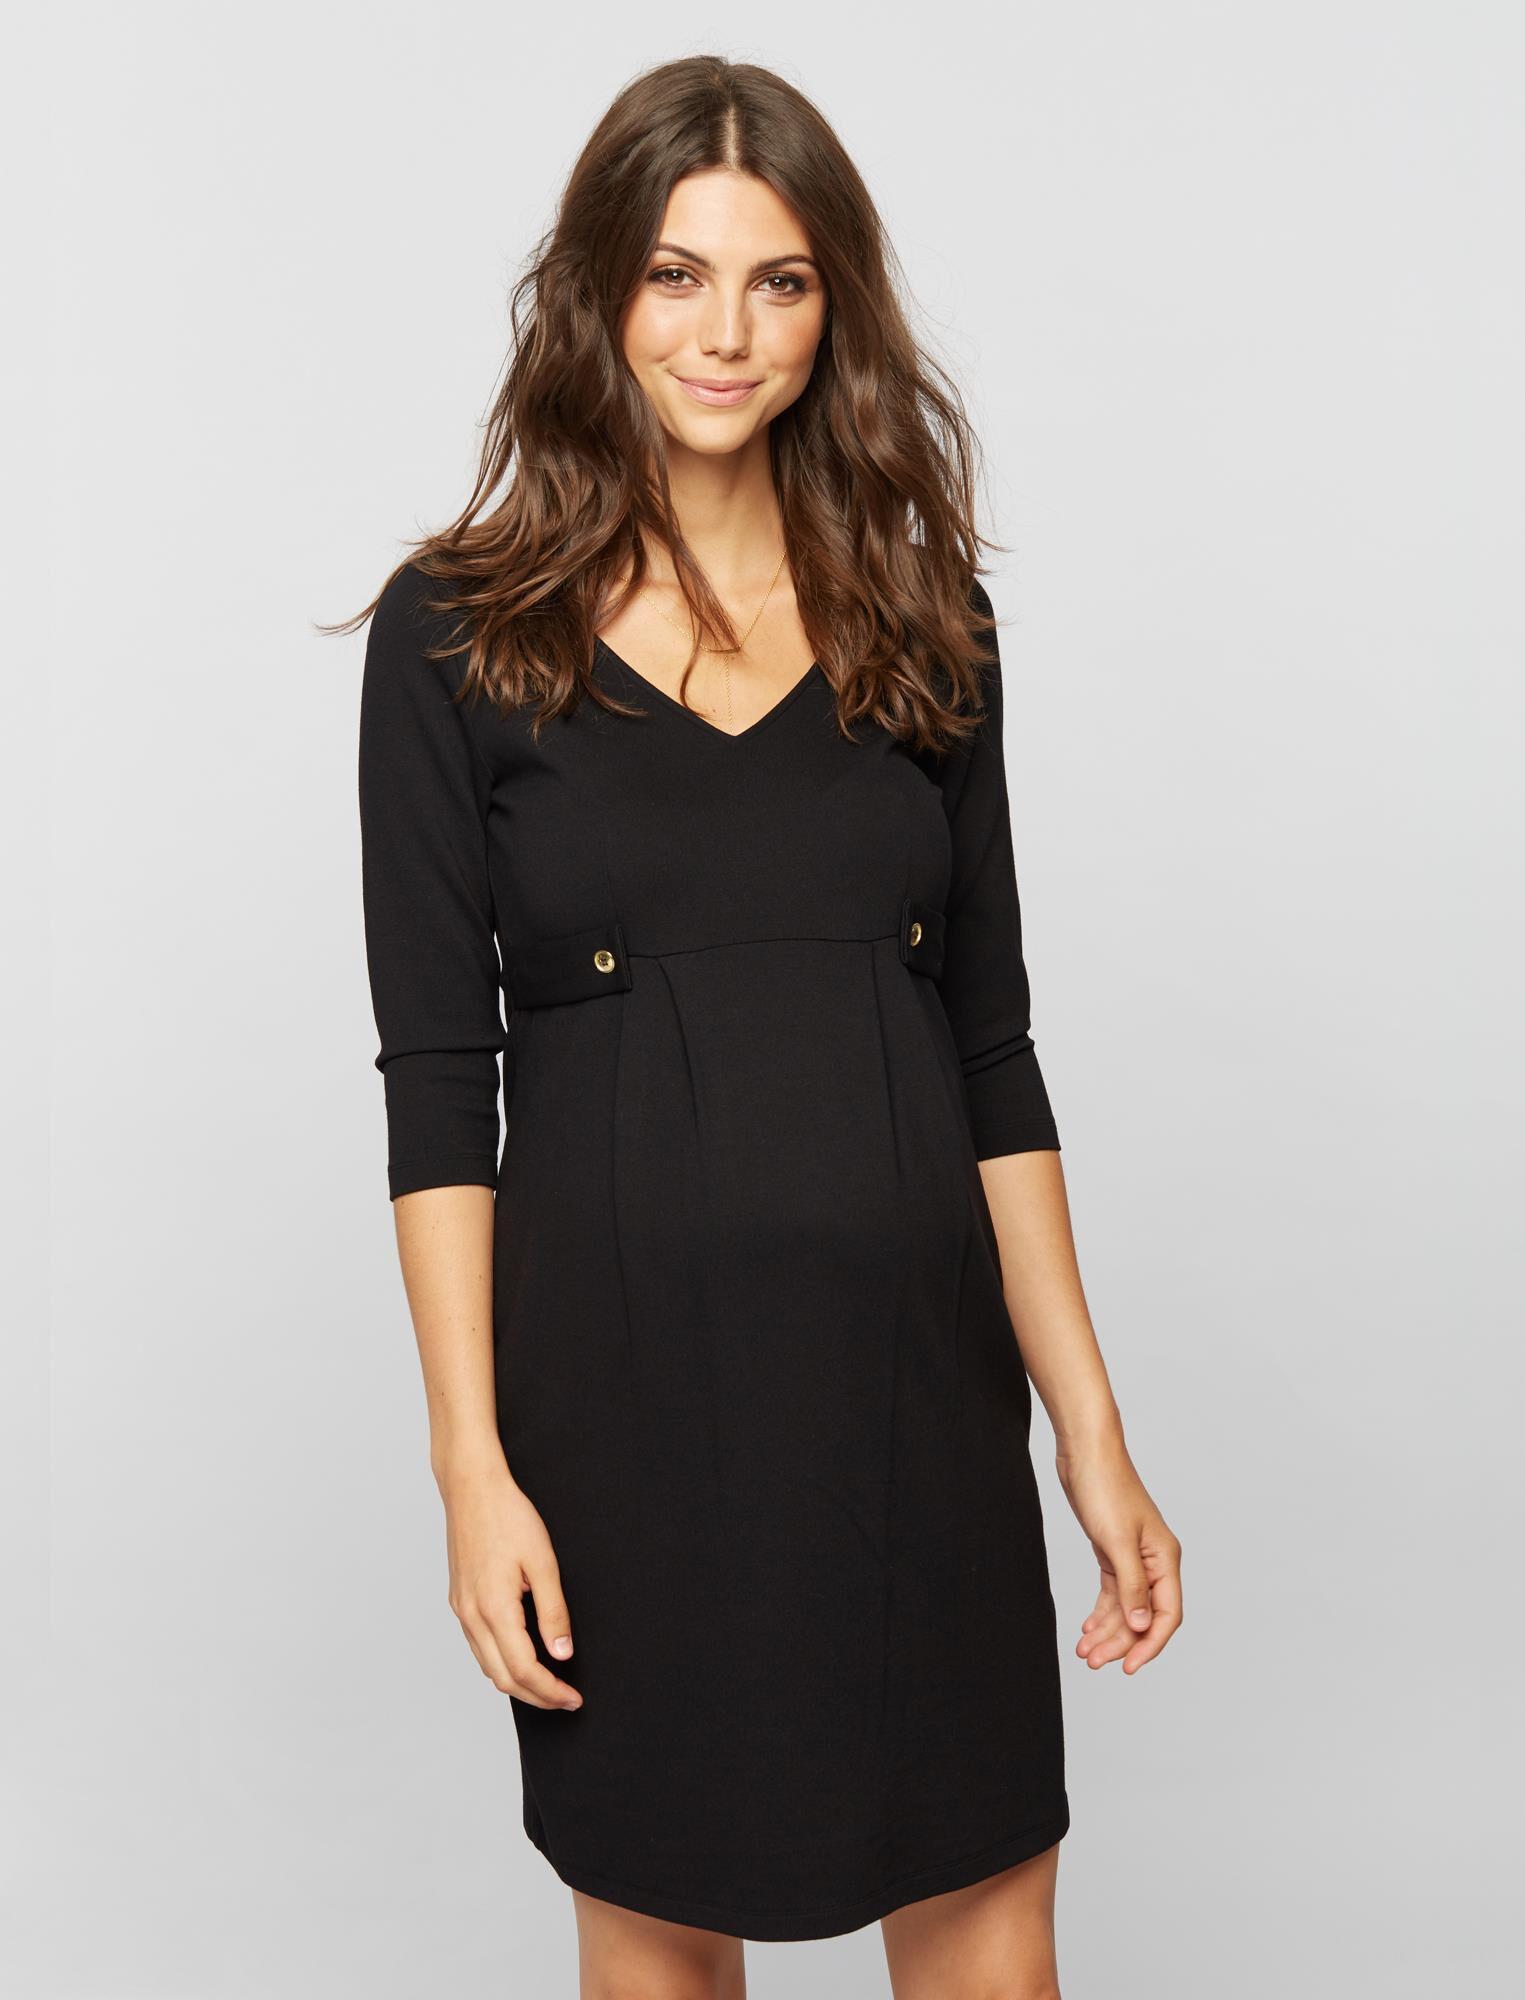 Isabella Oliver Marlow Maternity Dress- Black